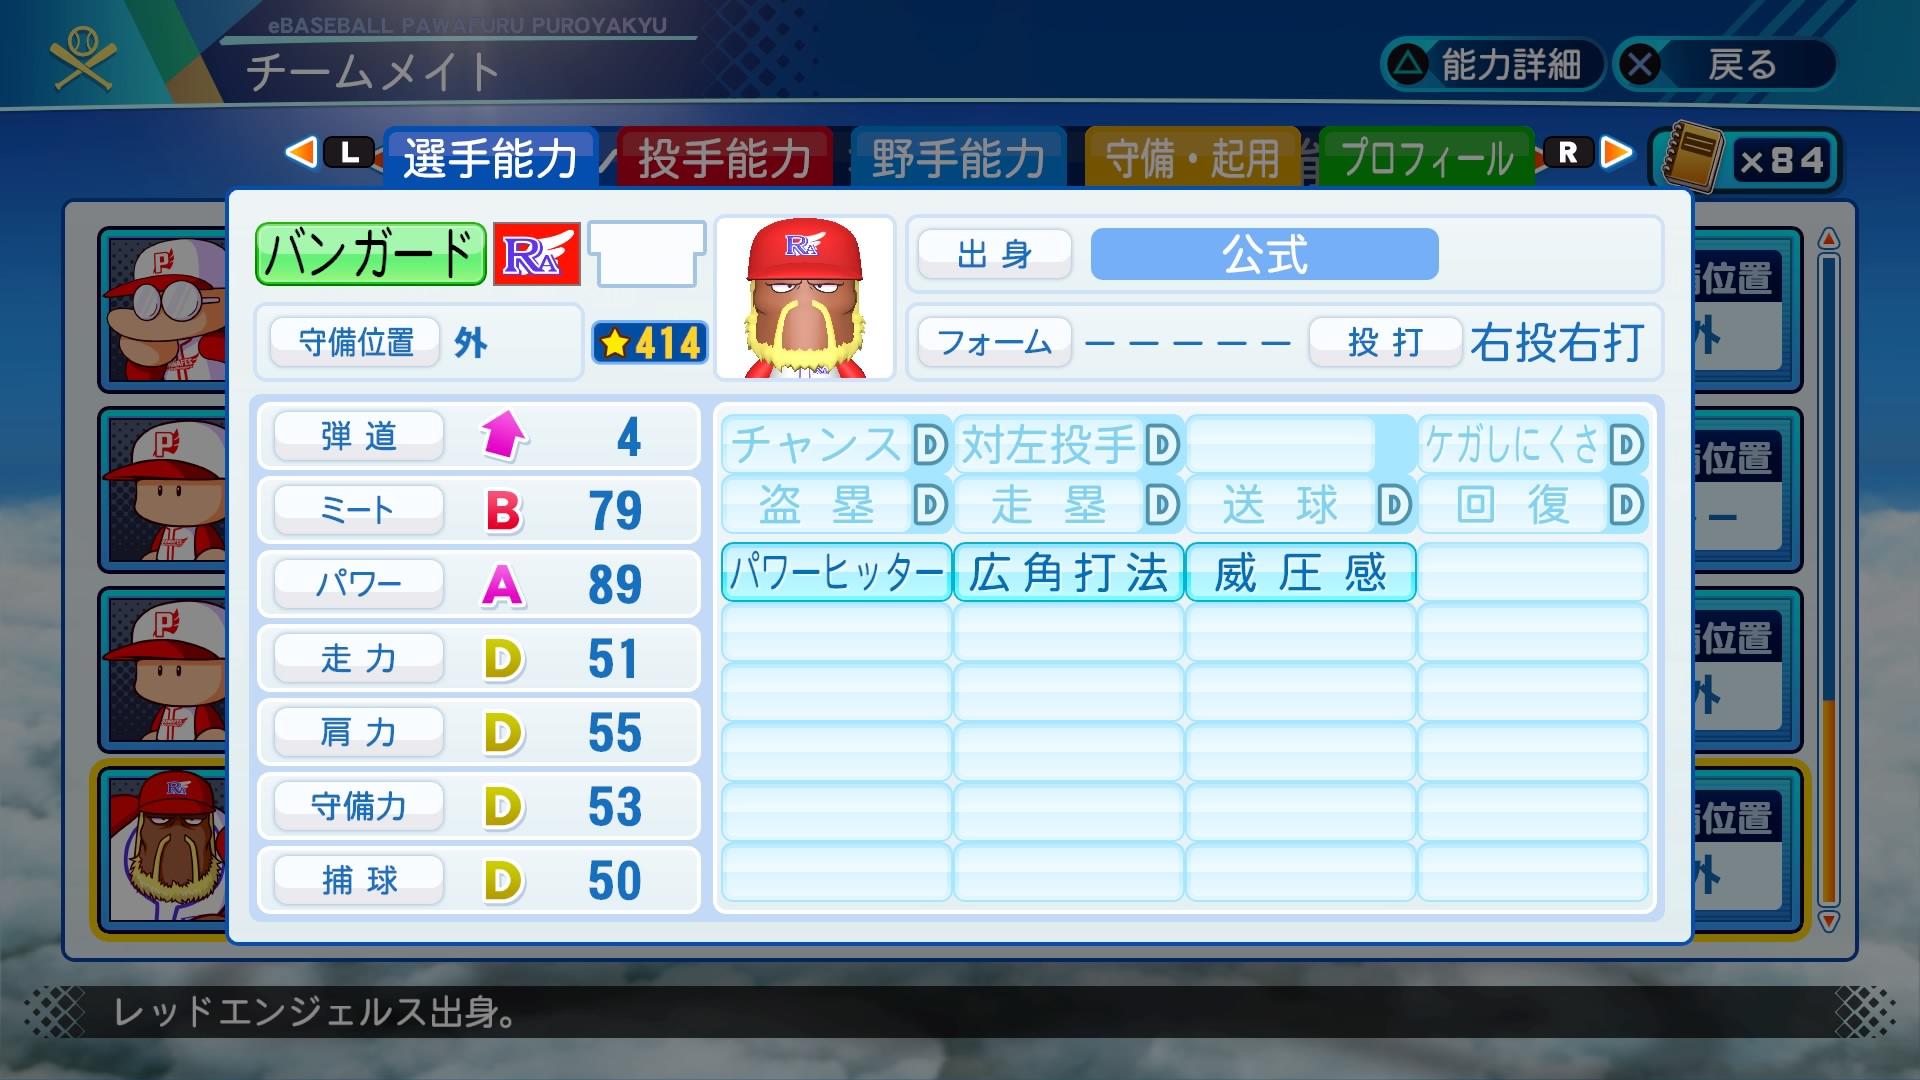 E07qjm3VUAMD7y9.jpg